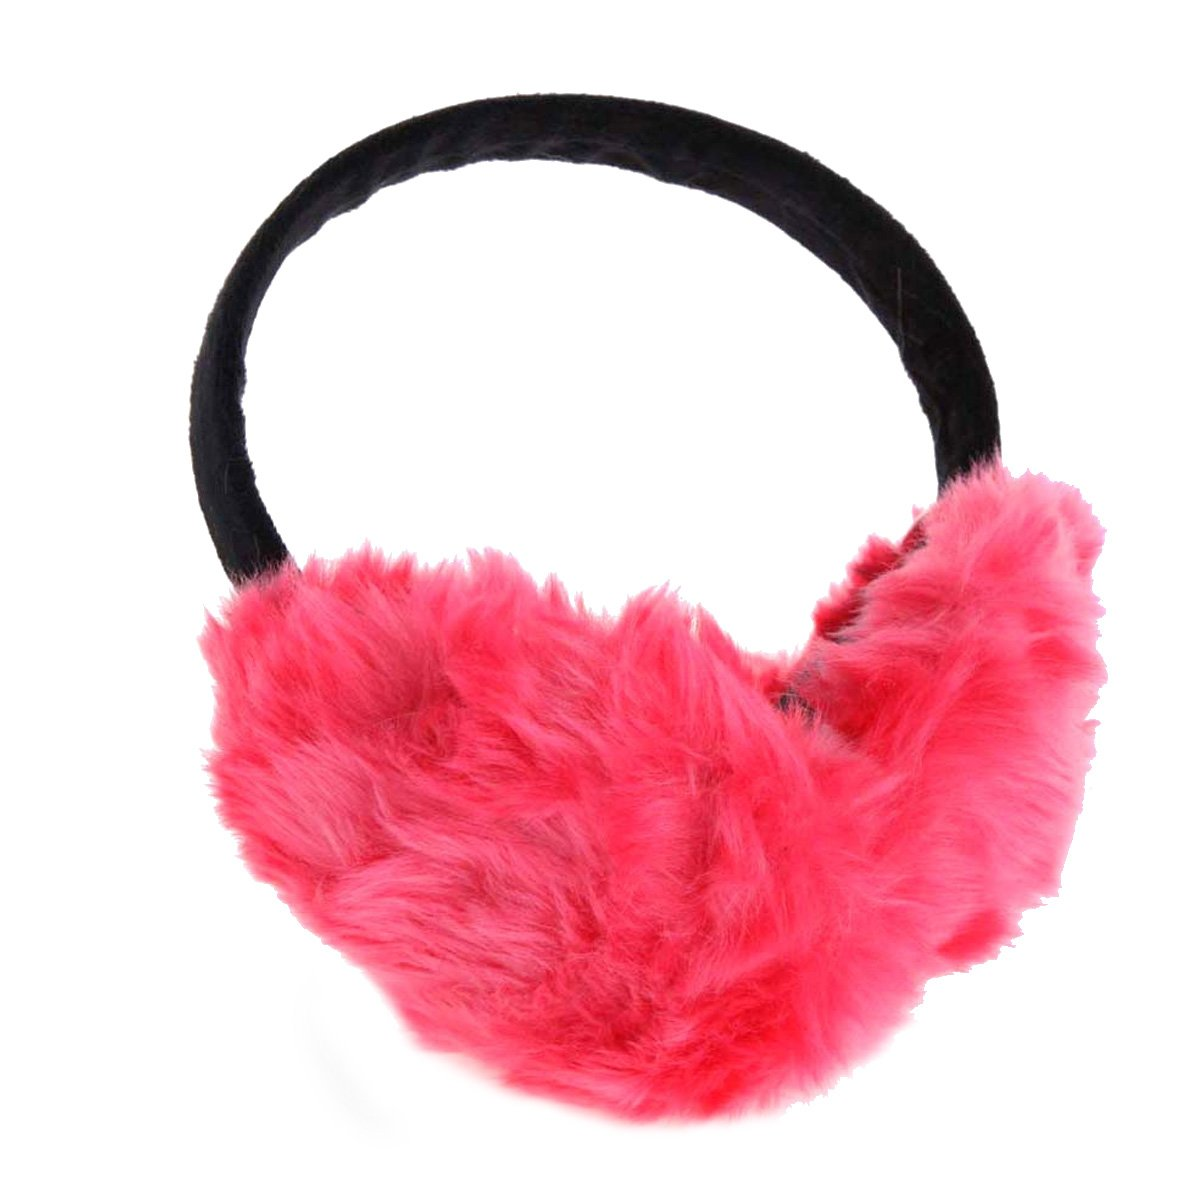 ChikaMika Winter Earmuffs for Women Girls Winter Ear muffs Large Over Ear Foldable EarMuff B20B01-Dark Gray